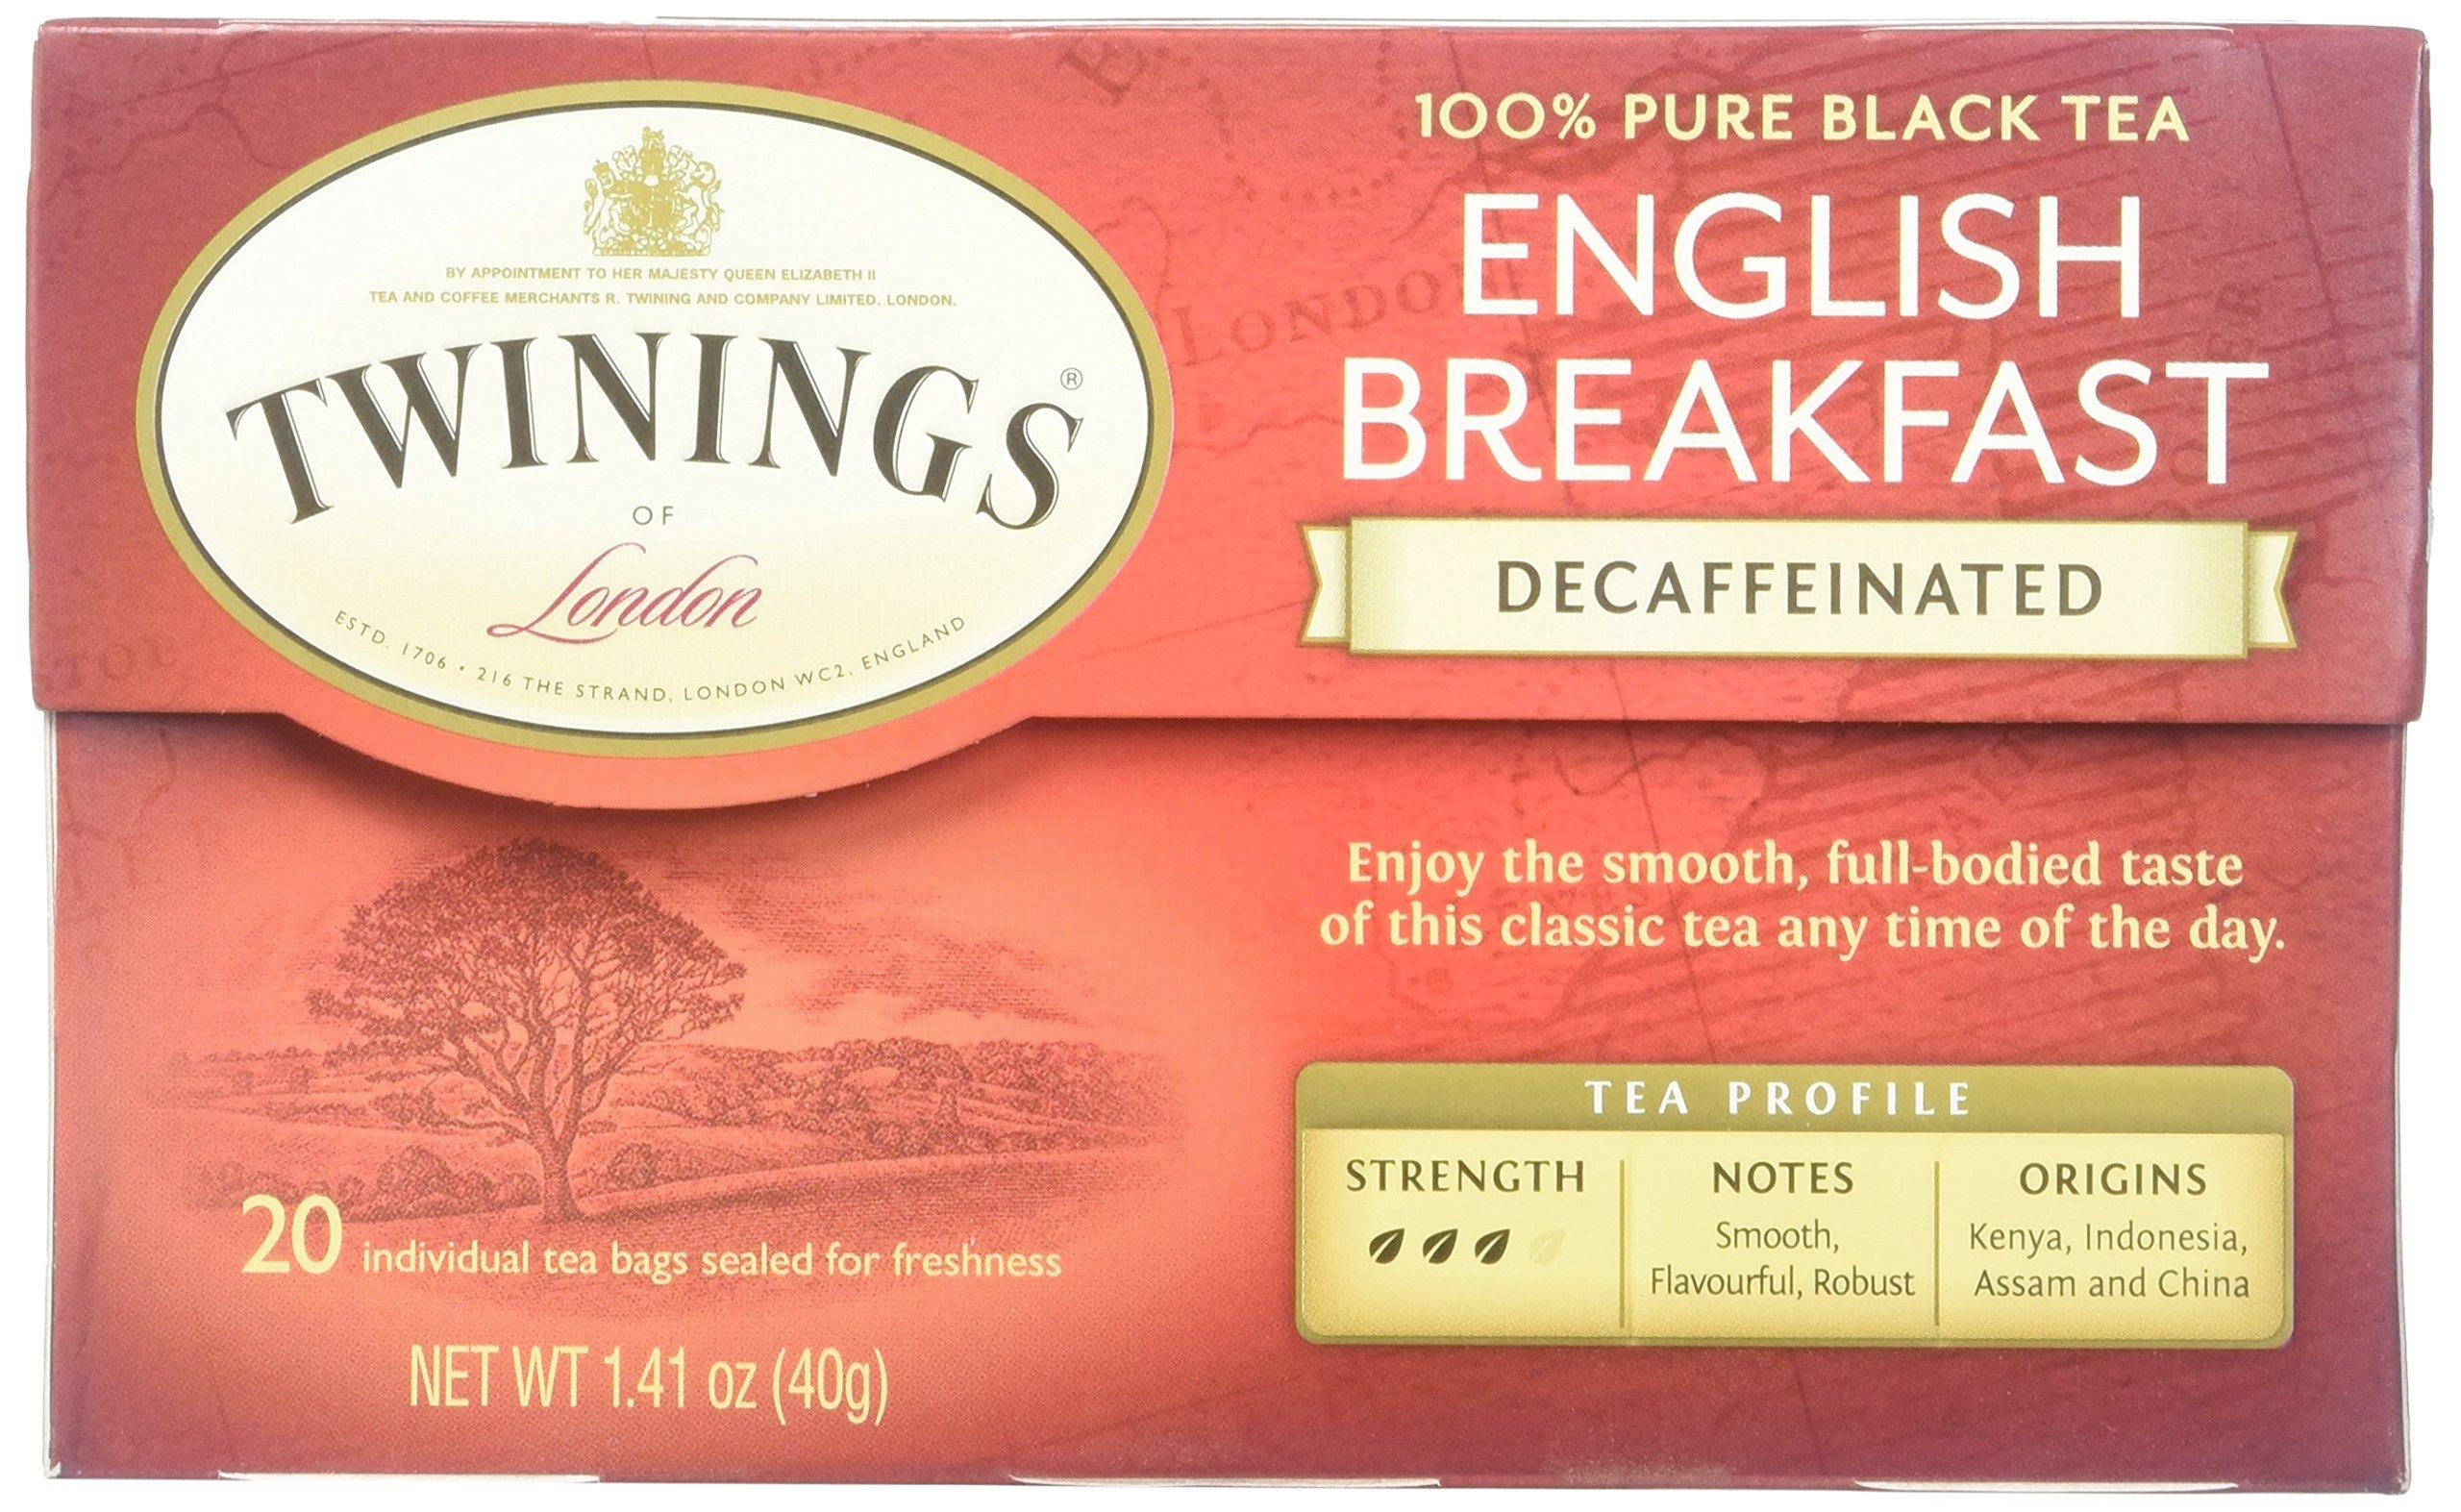 Twinings English Breakfast Tea, Decaffeinated, Tea Bags, 20 ct